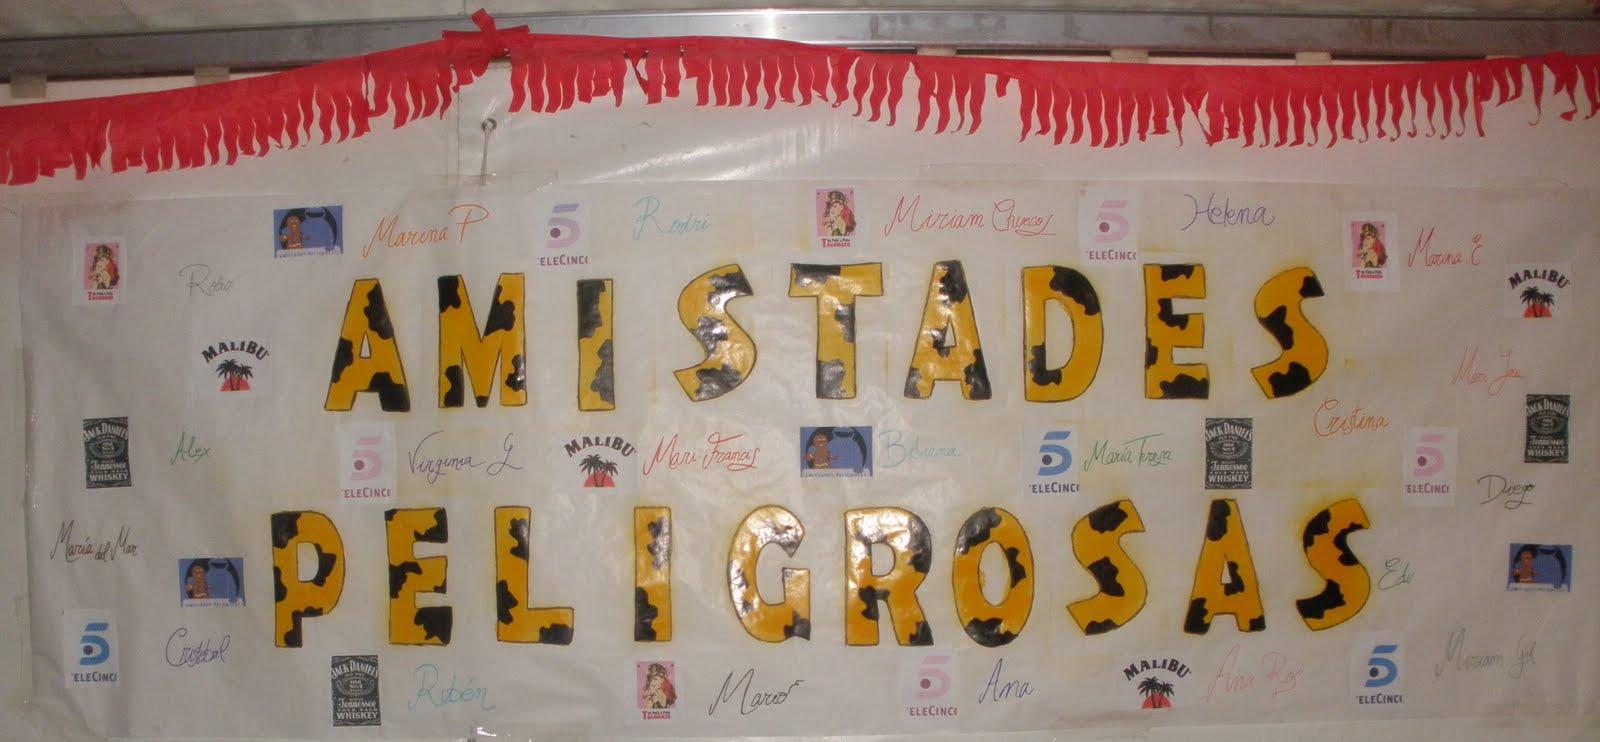 AMISTADES PELIGROSAS (L)